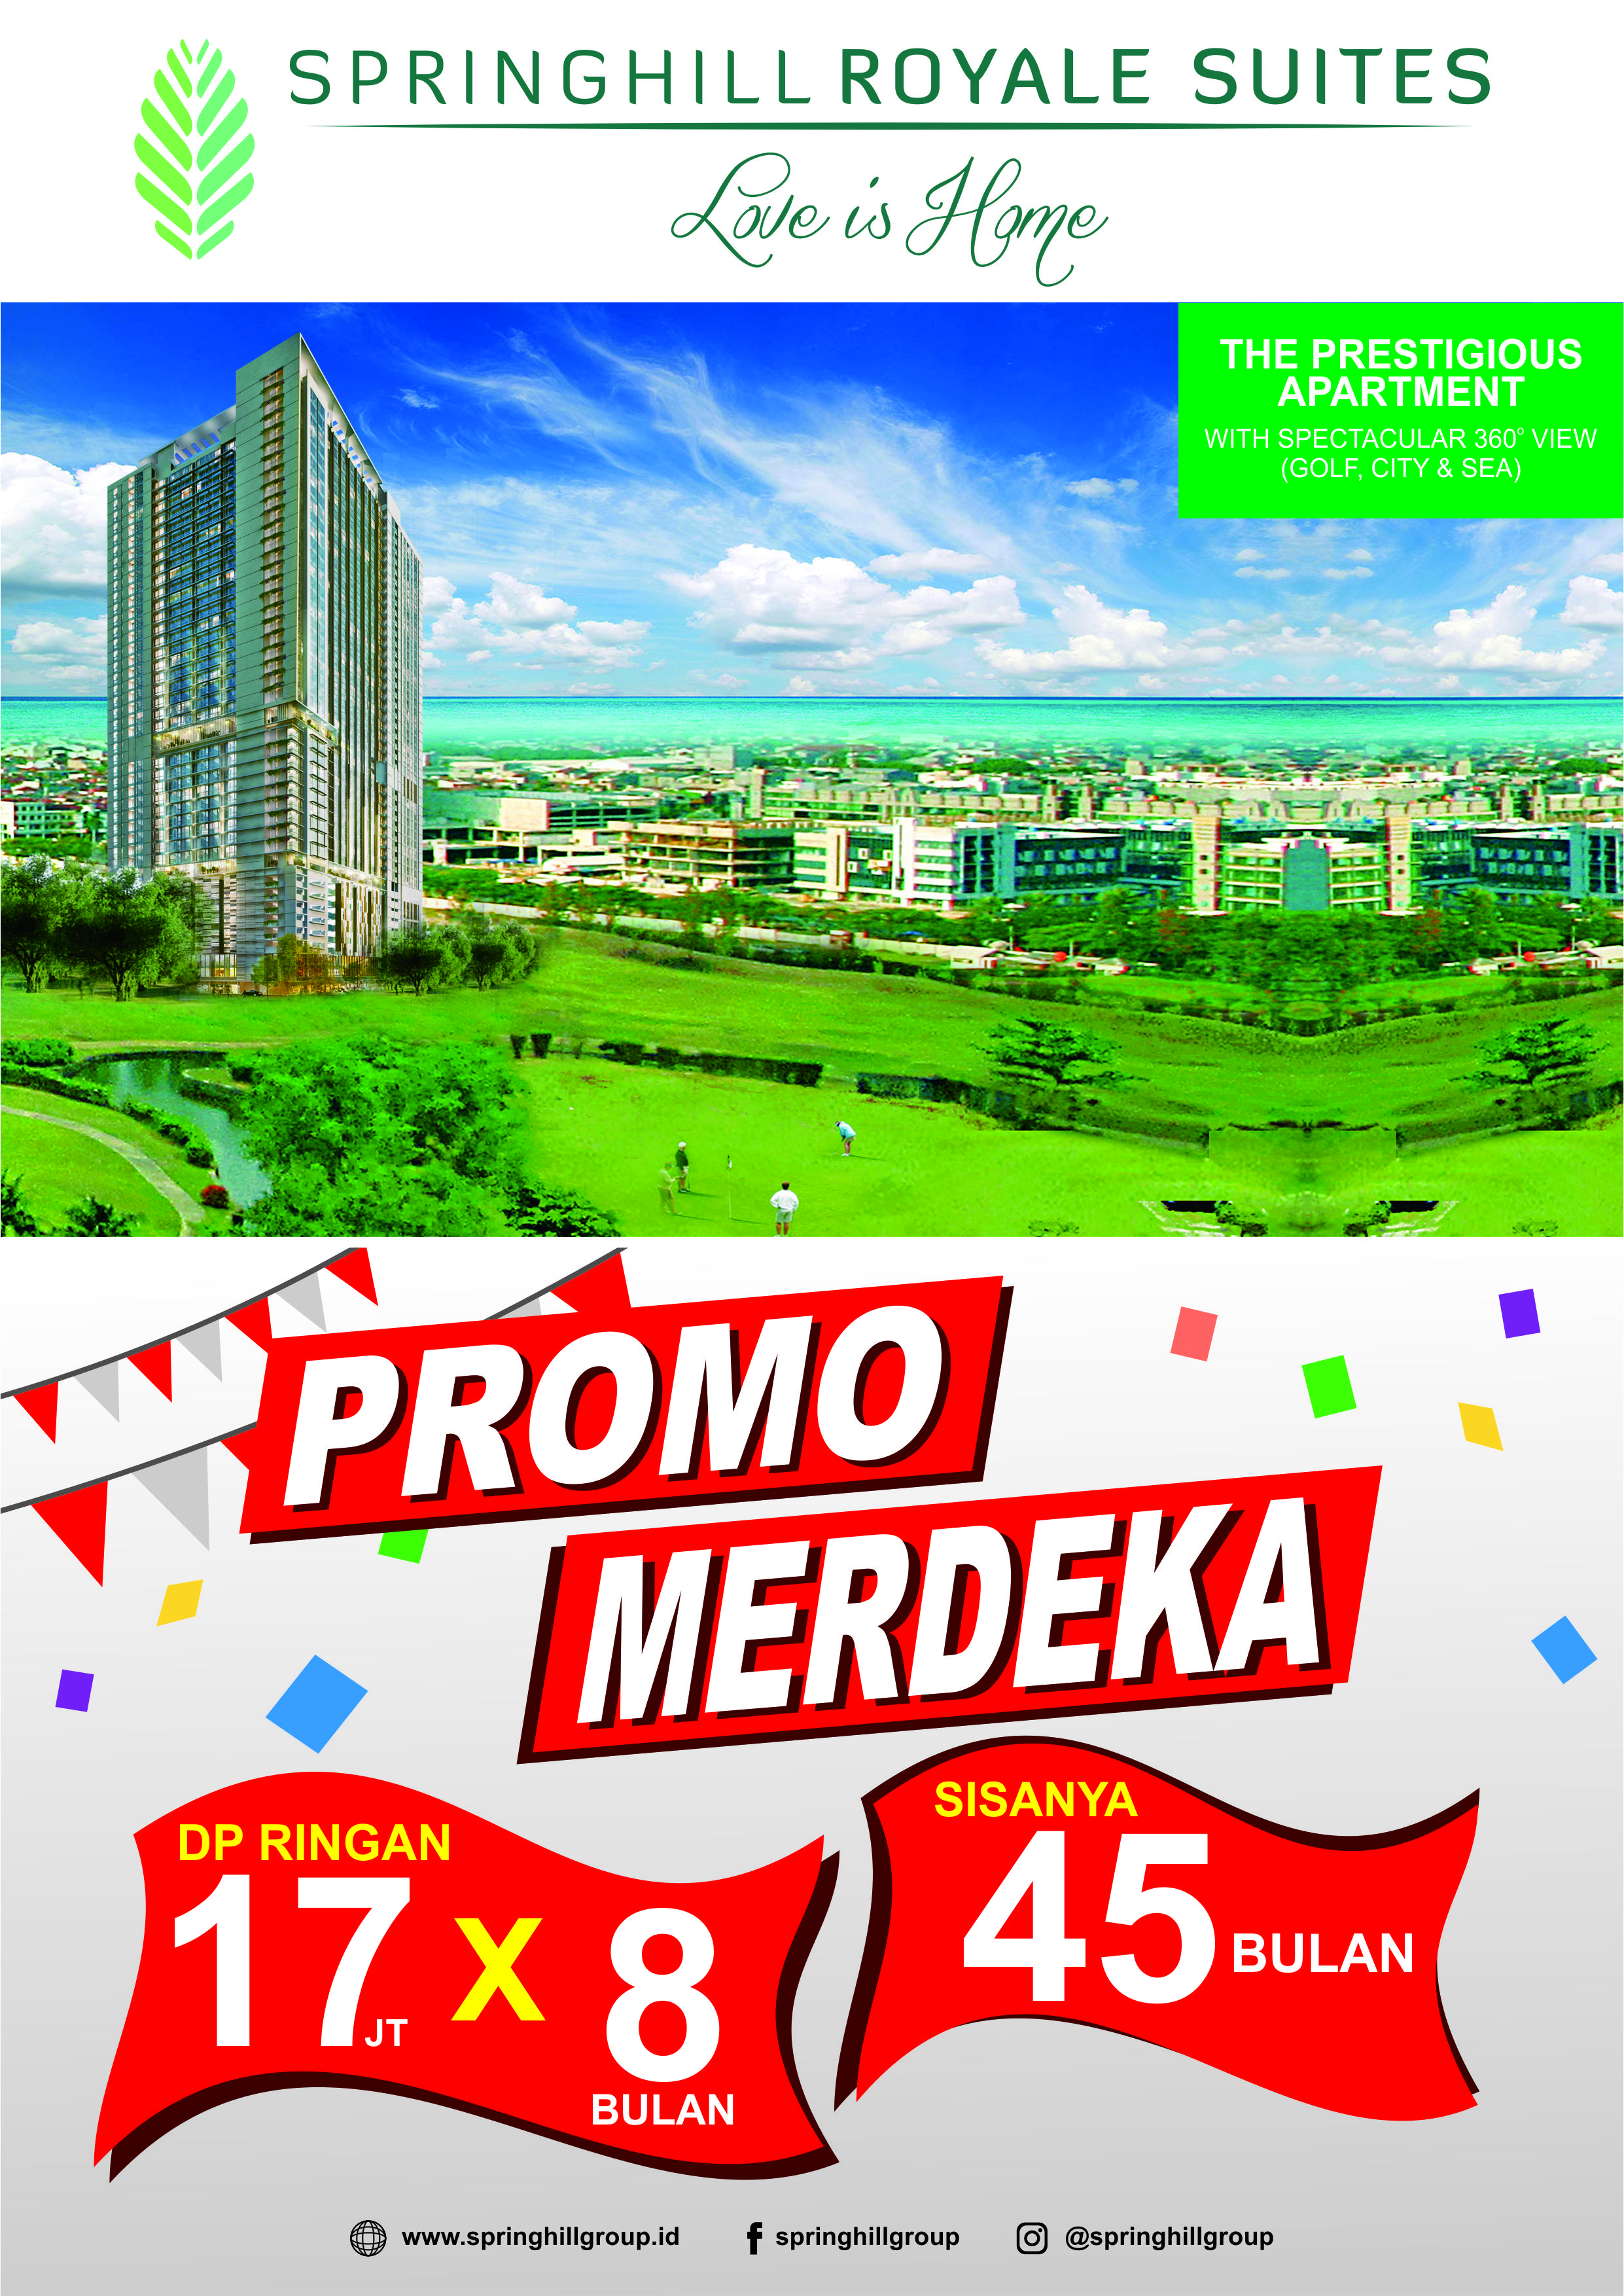 Promo Merdeka!!